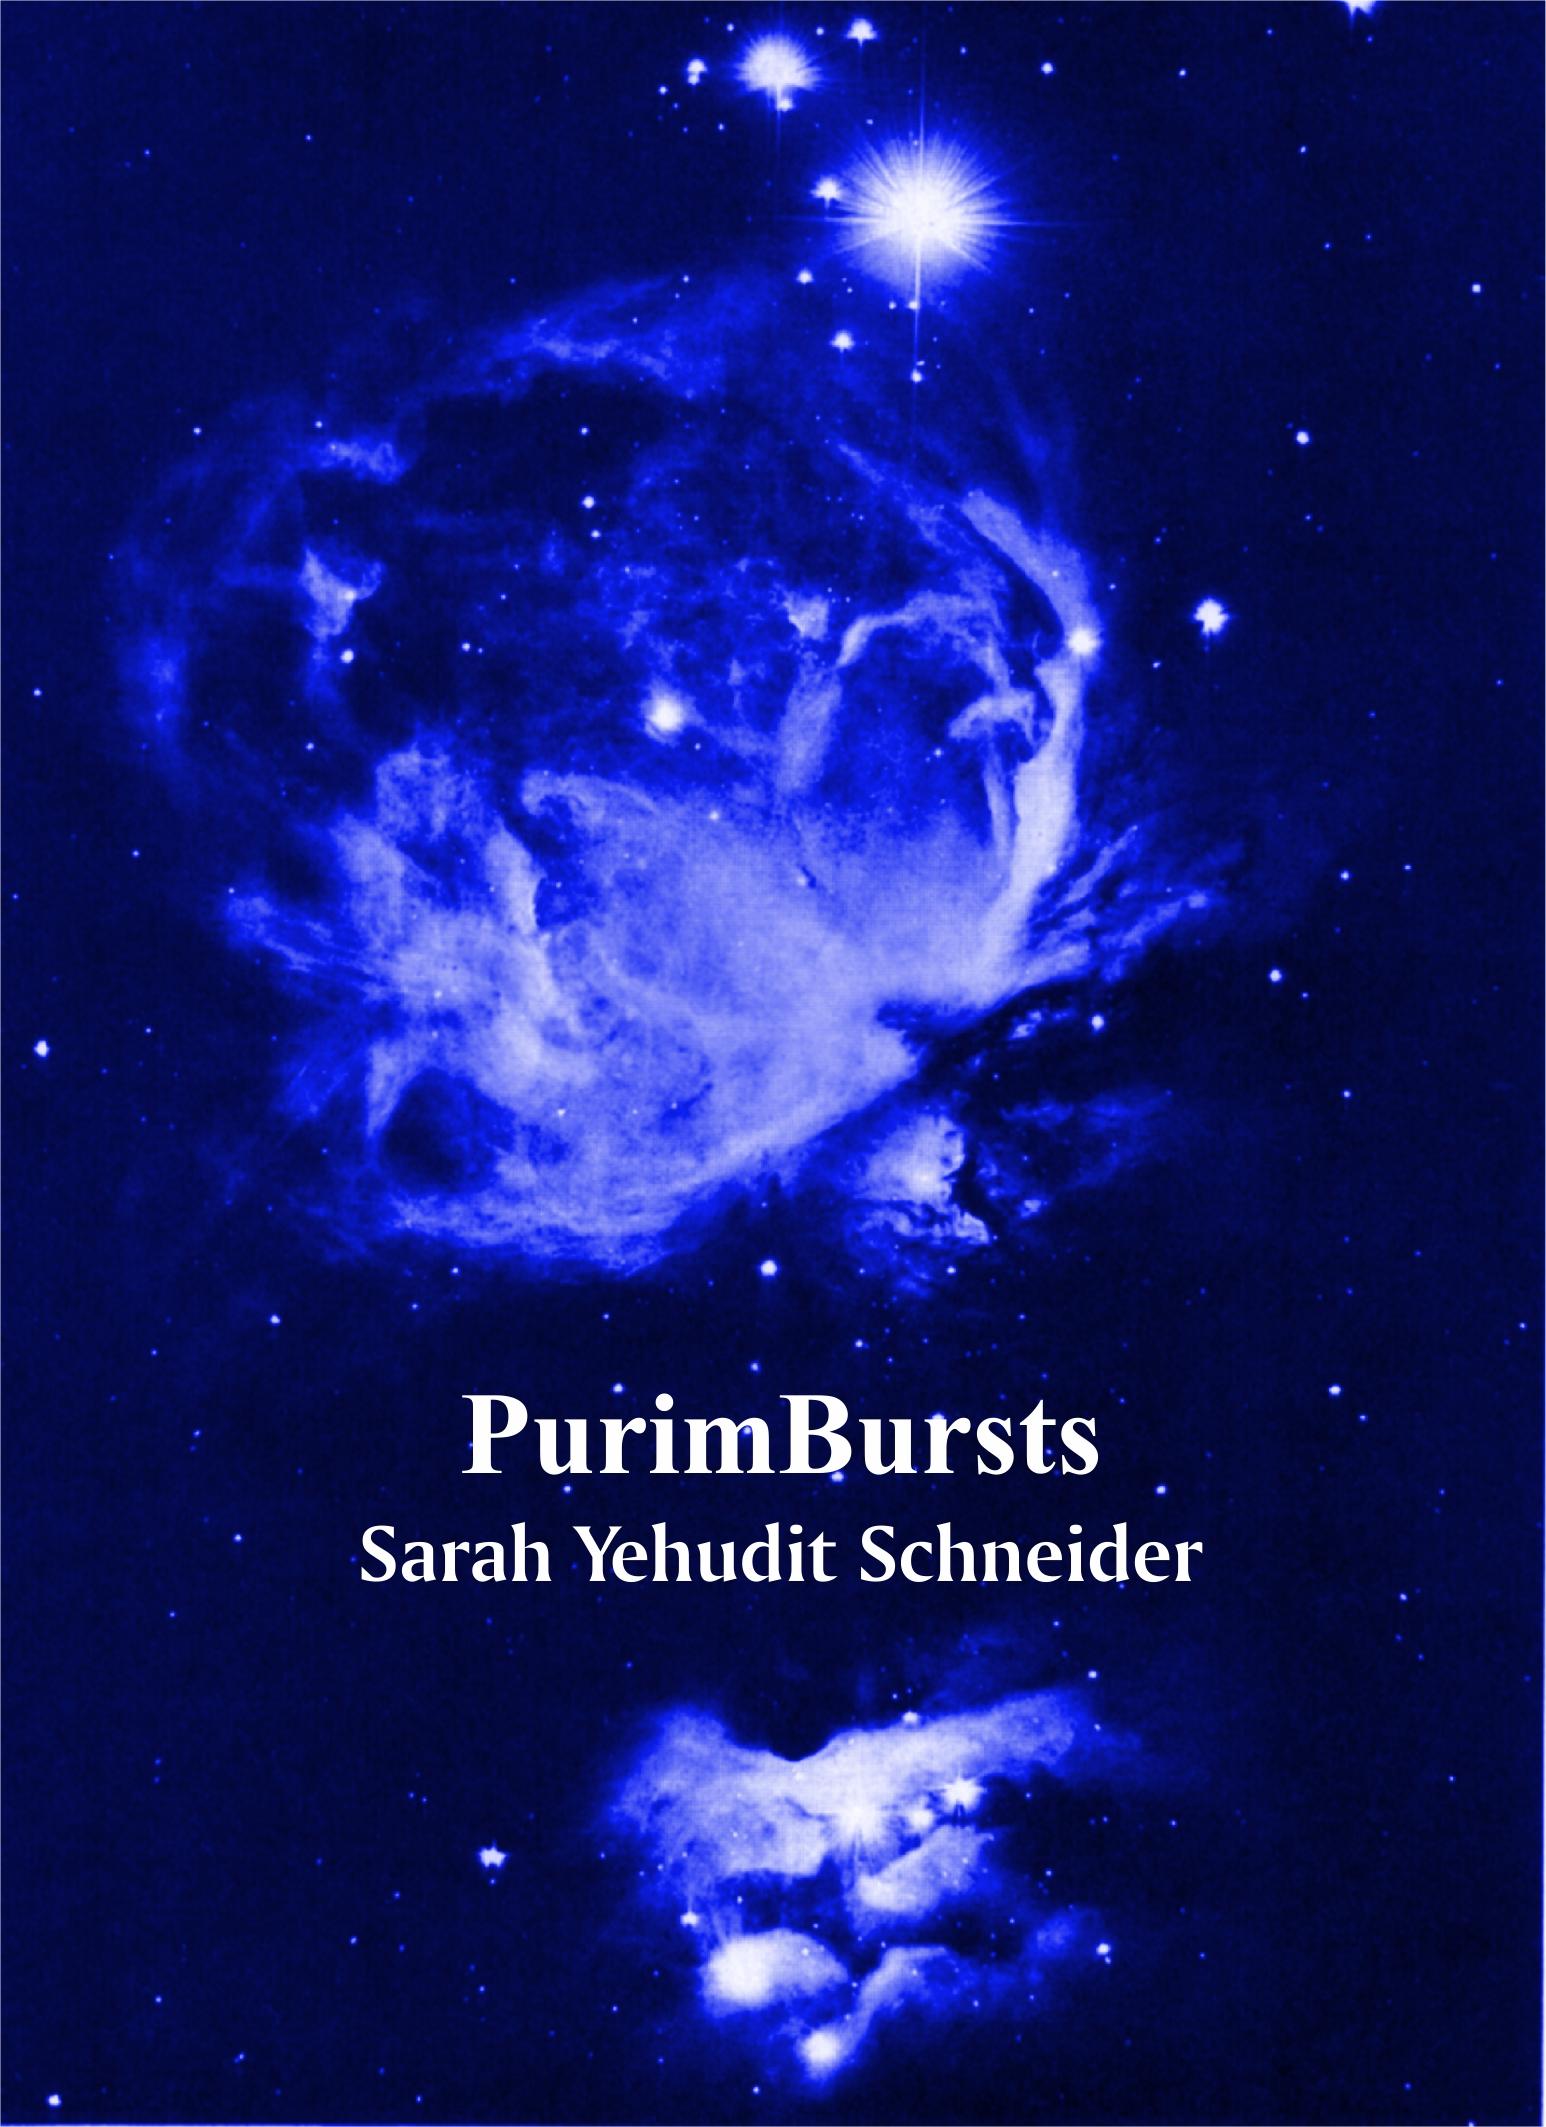 PurimBursts